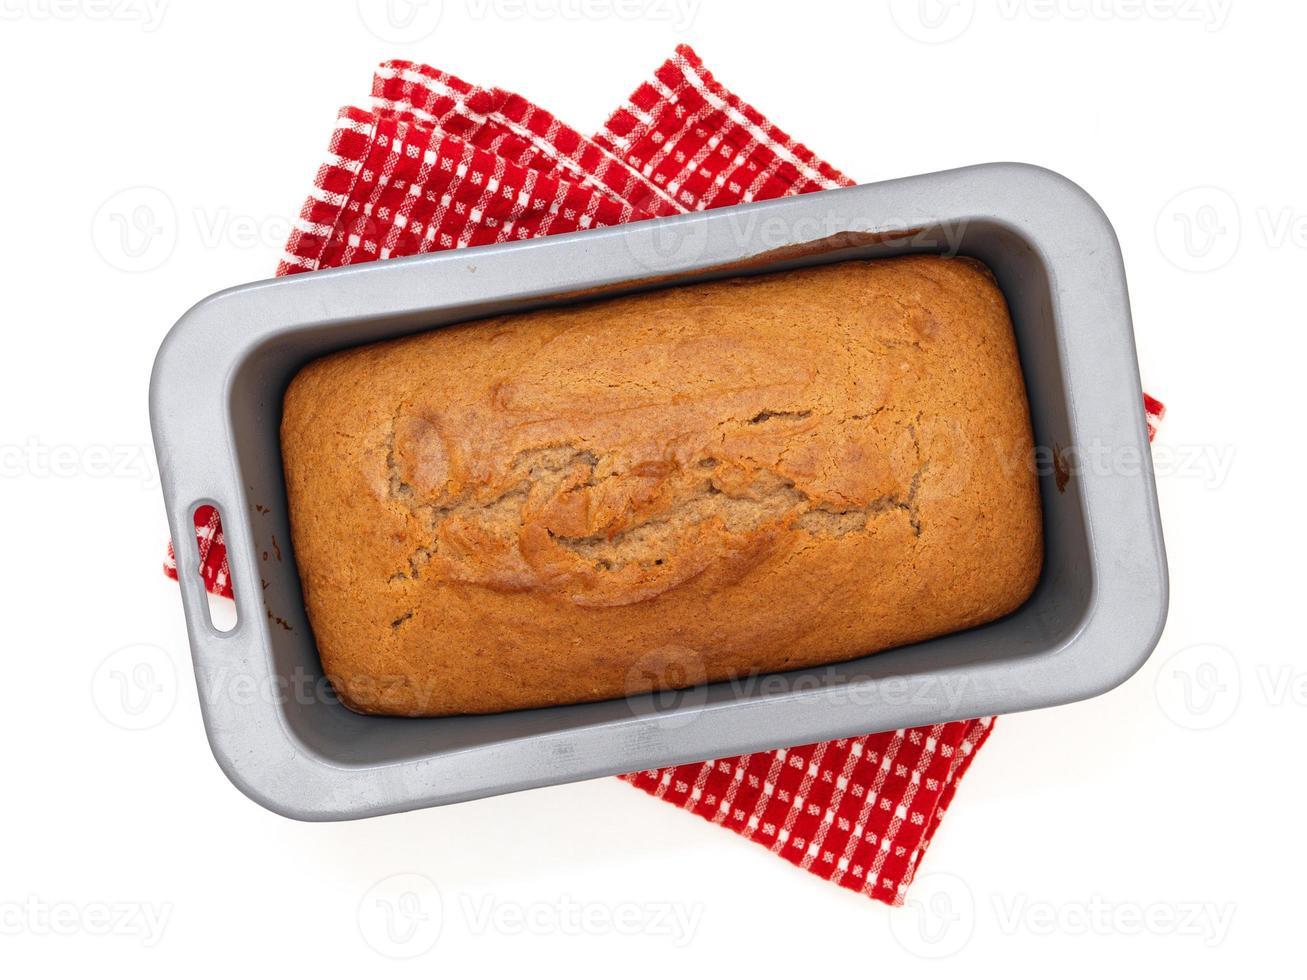 gebackener Kuchen foto